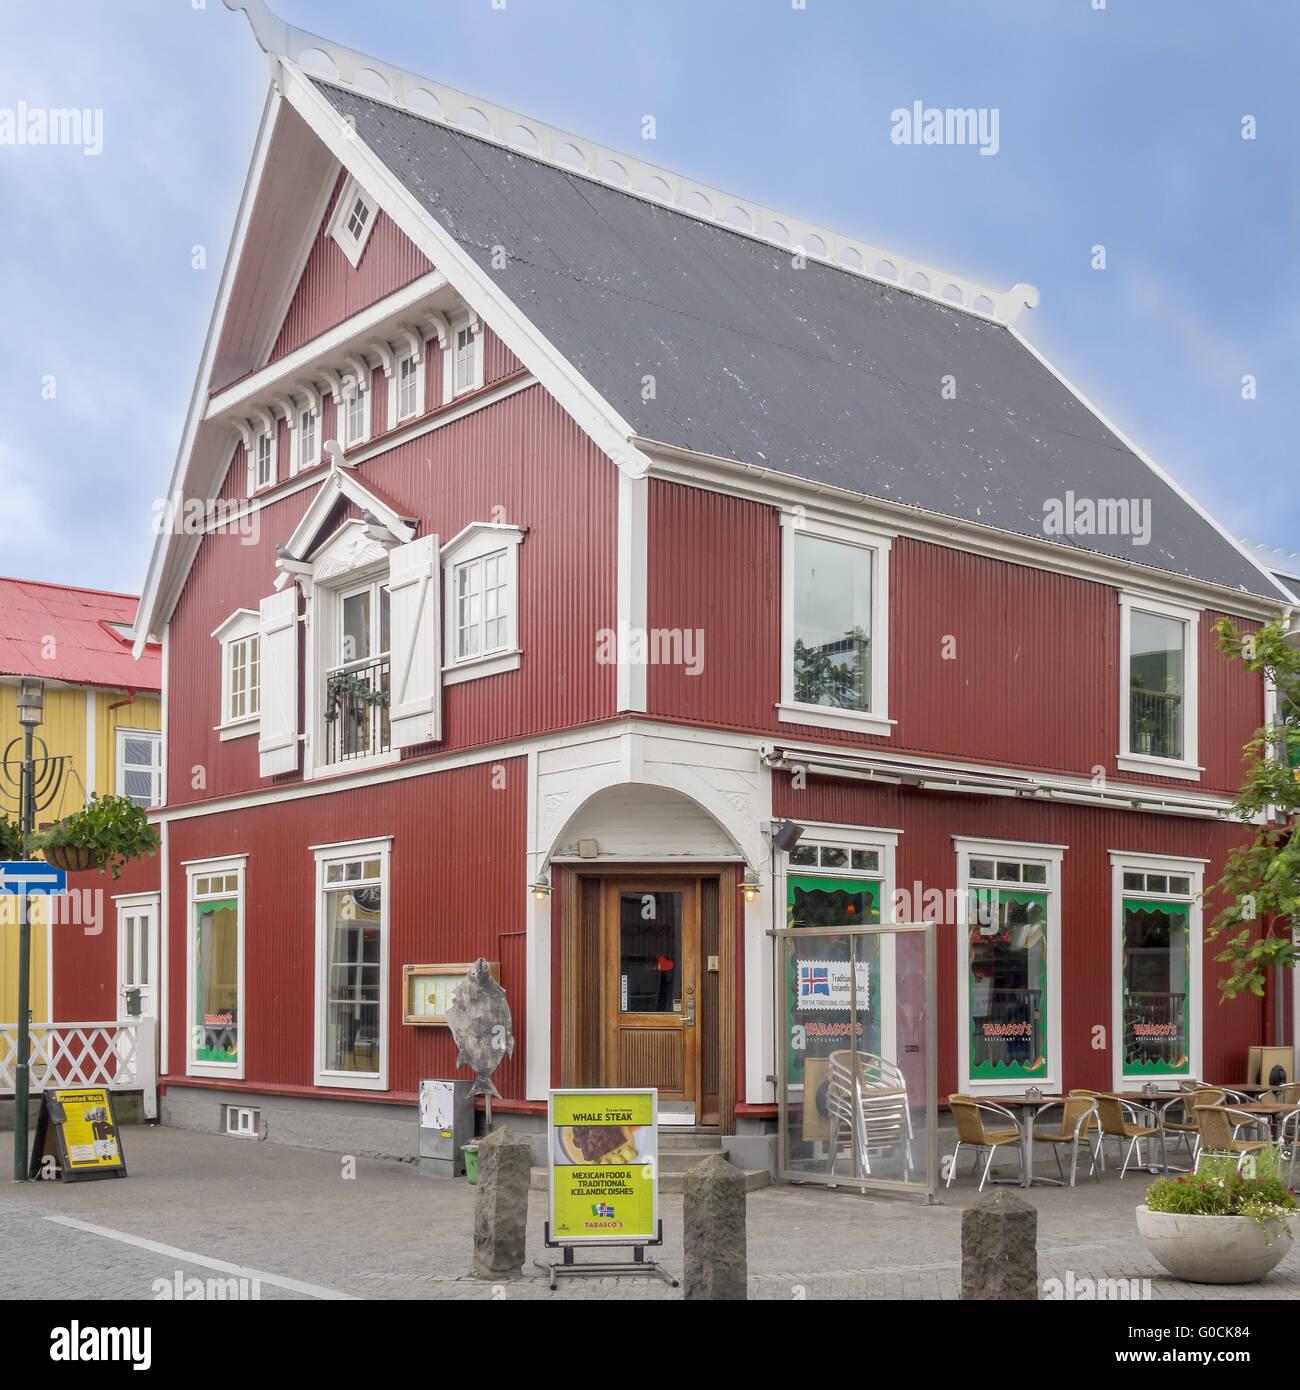 Restaurant Selling Whale Steaks Reykjavik Iceland - Stock Image